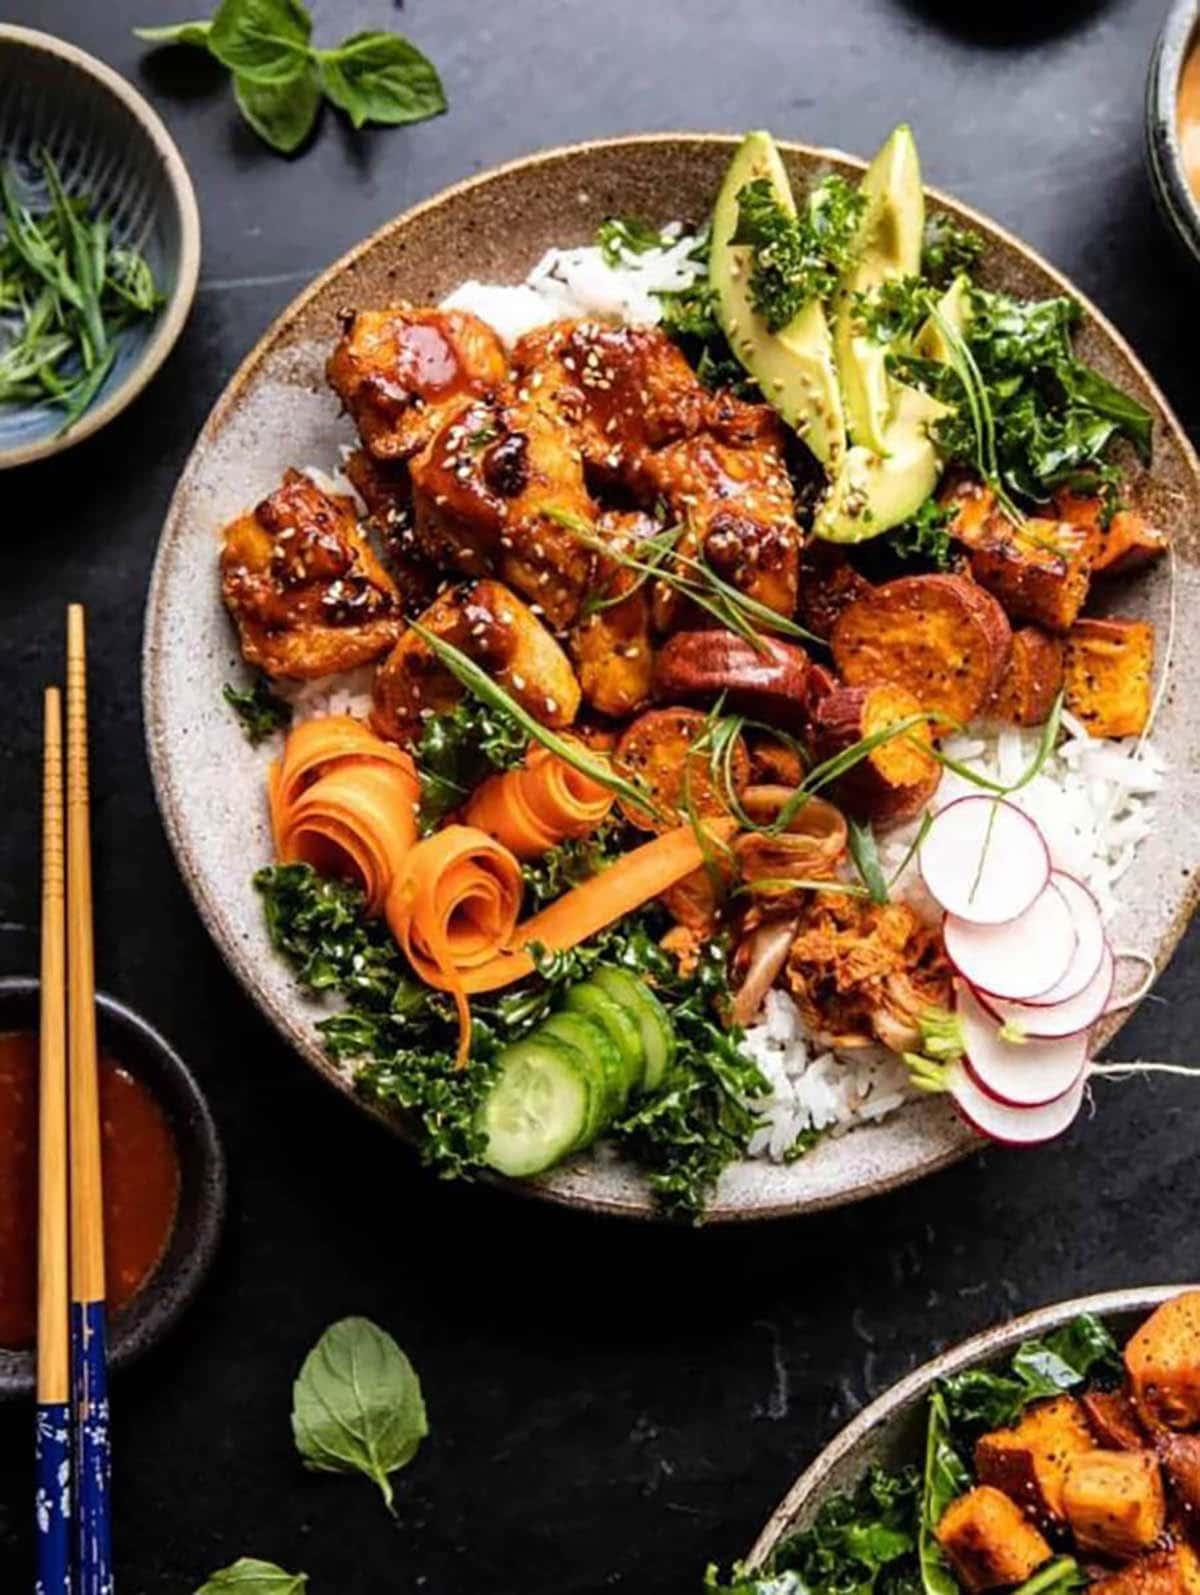 Sheet Pan Korean Chicken with avocado, carrots, kale, cucumber and radish